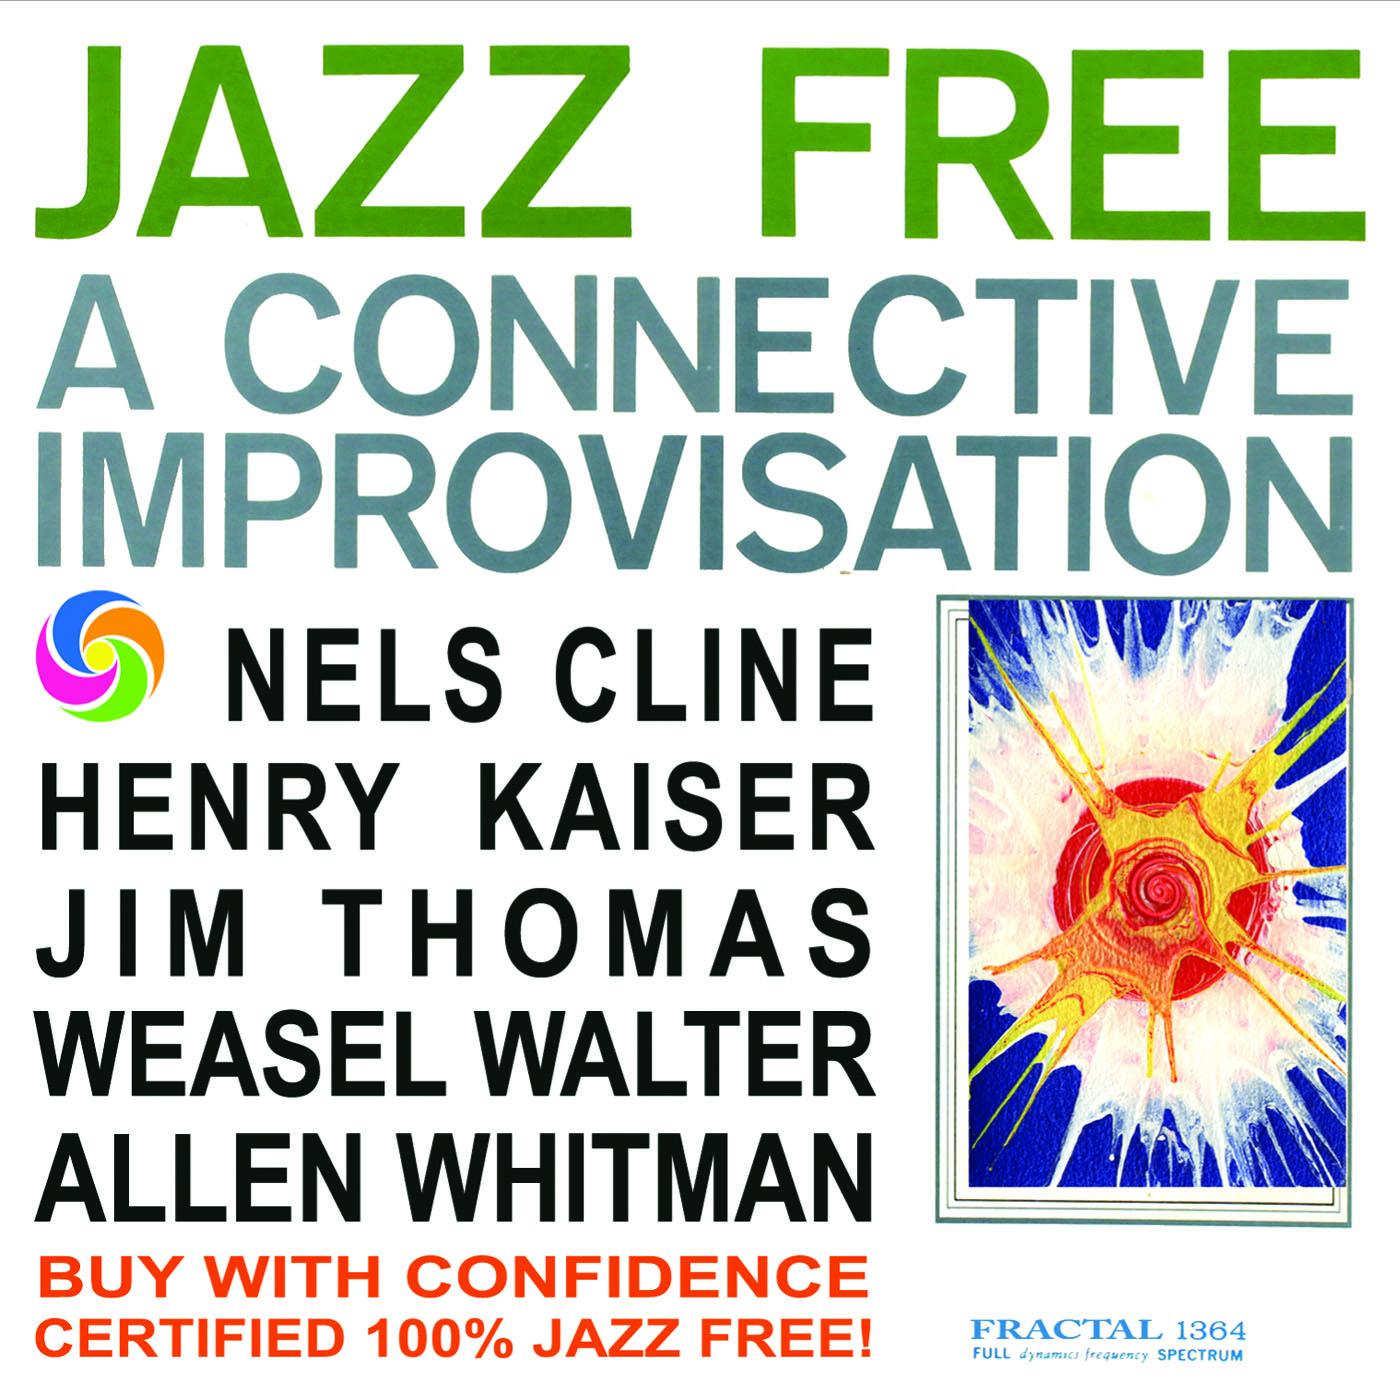 Jazz Free